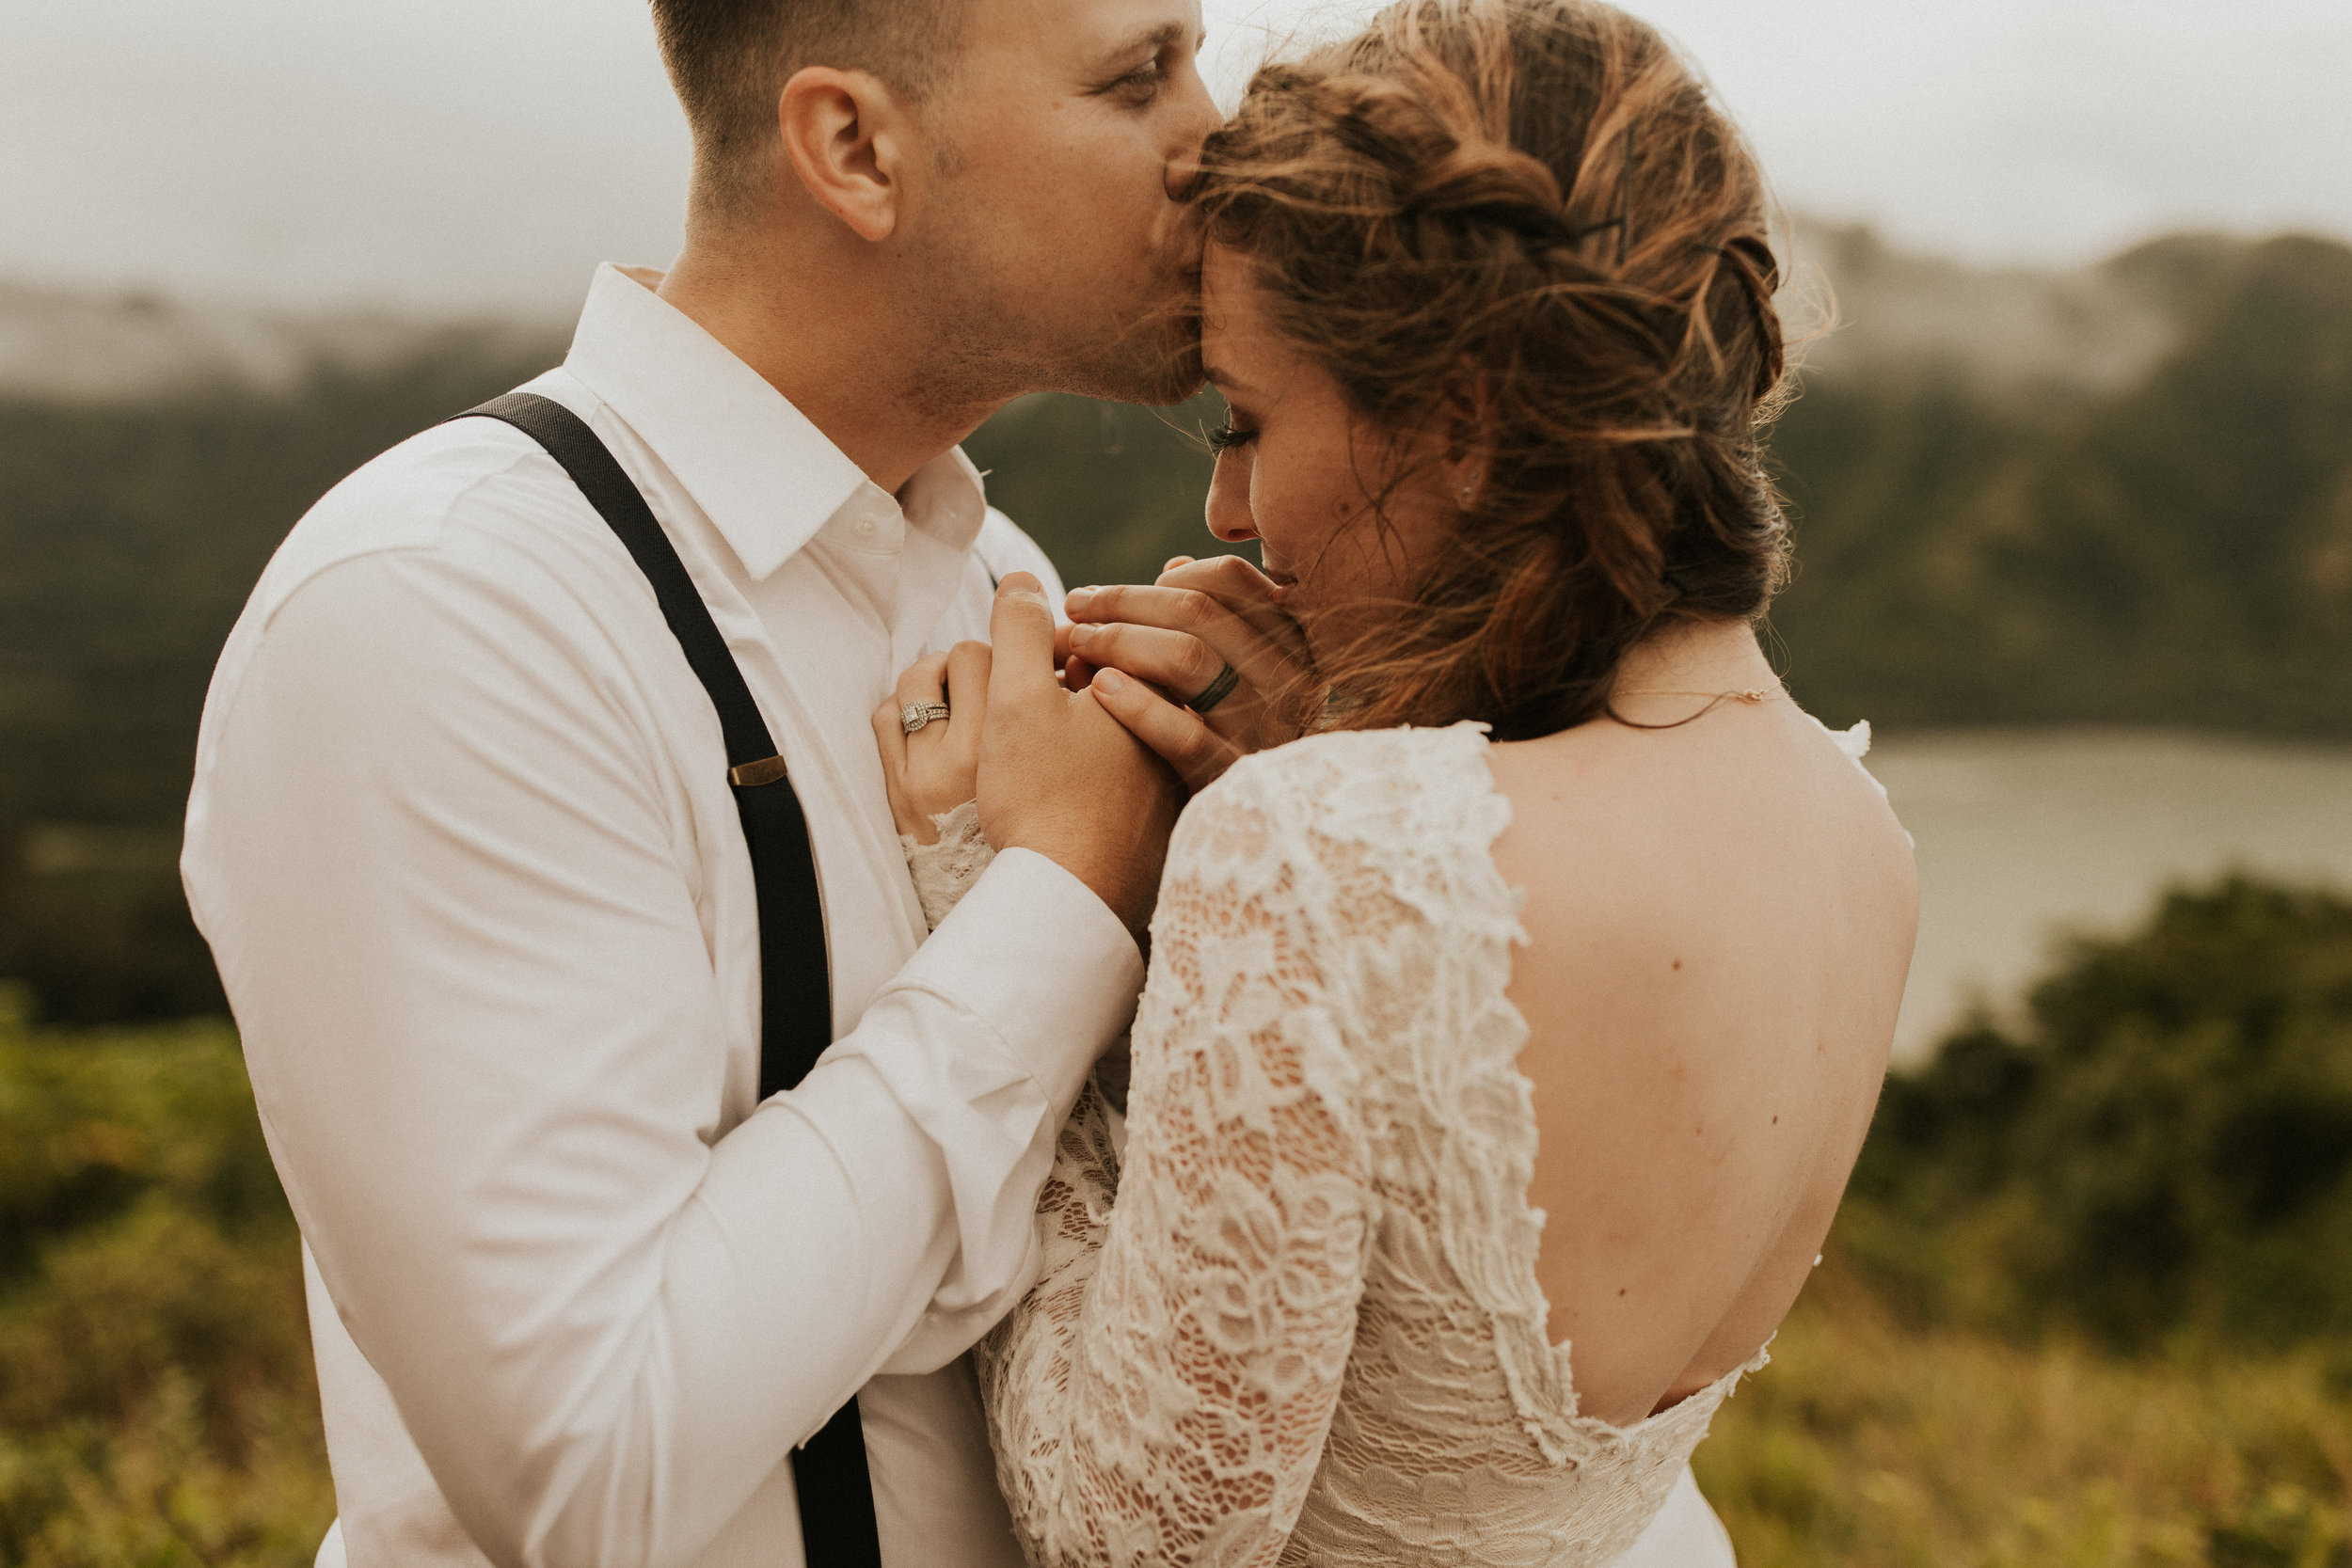 the-mclachlans-destination-elopement-photographers-mountain-hike-sena-eric-164.jpg